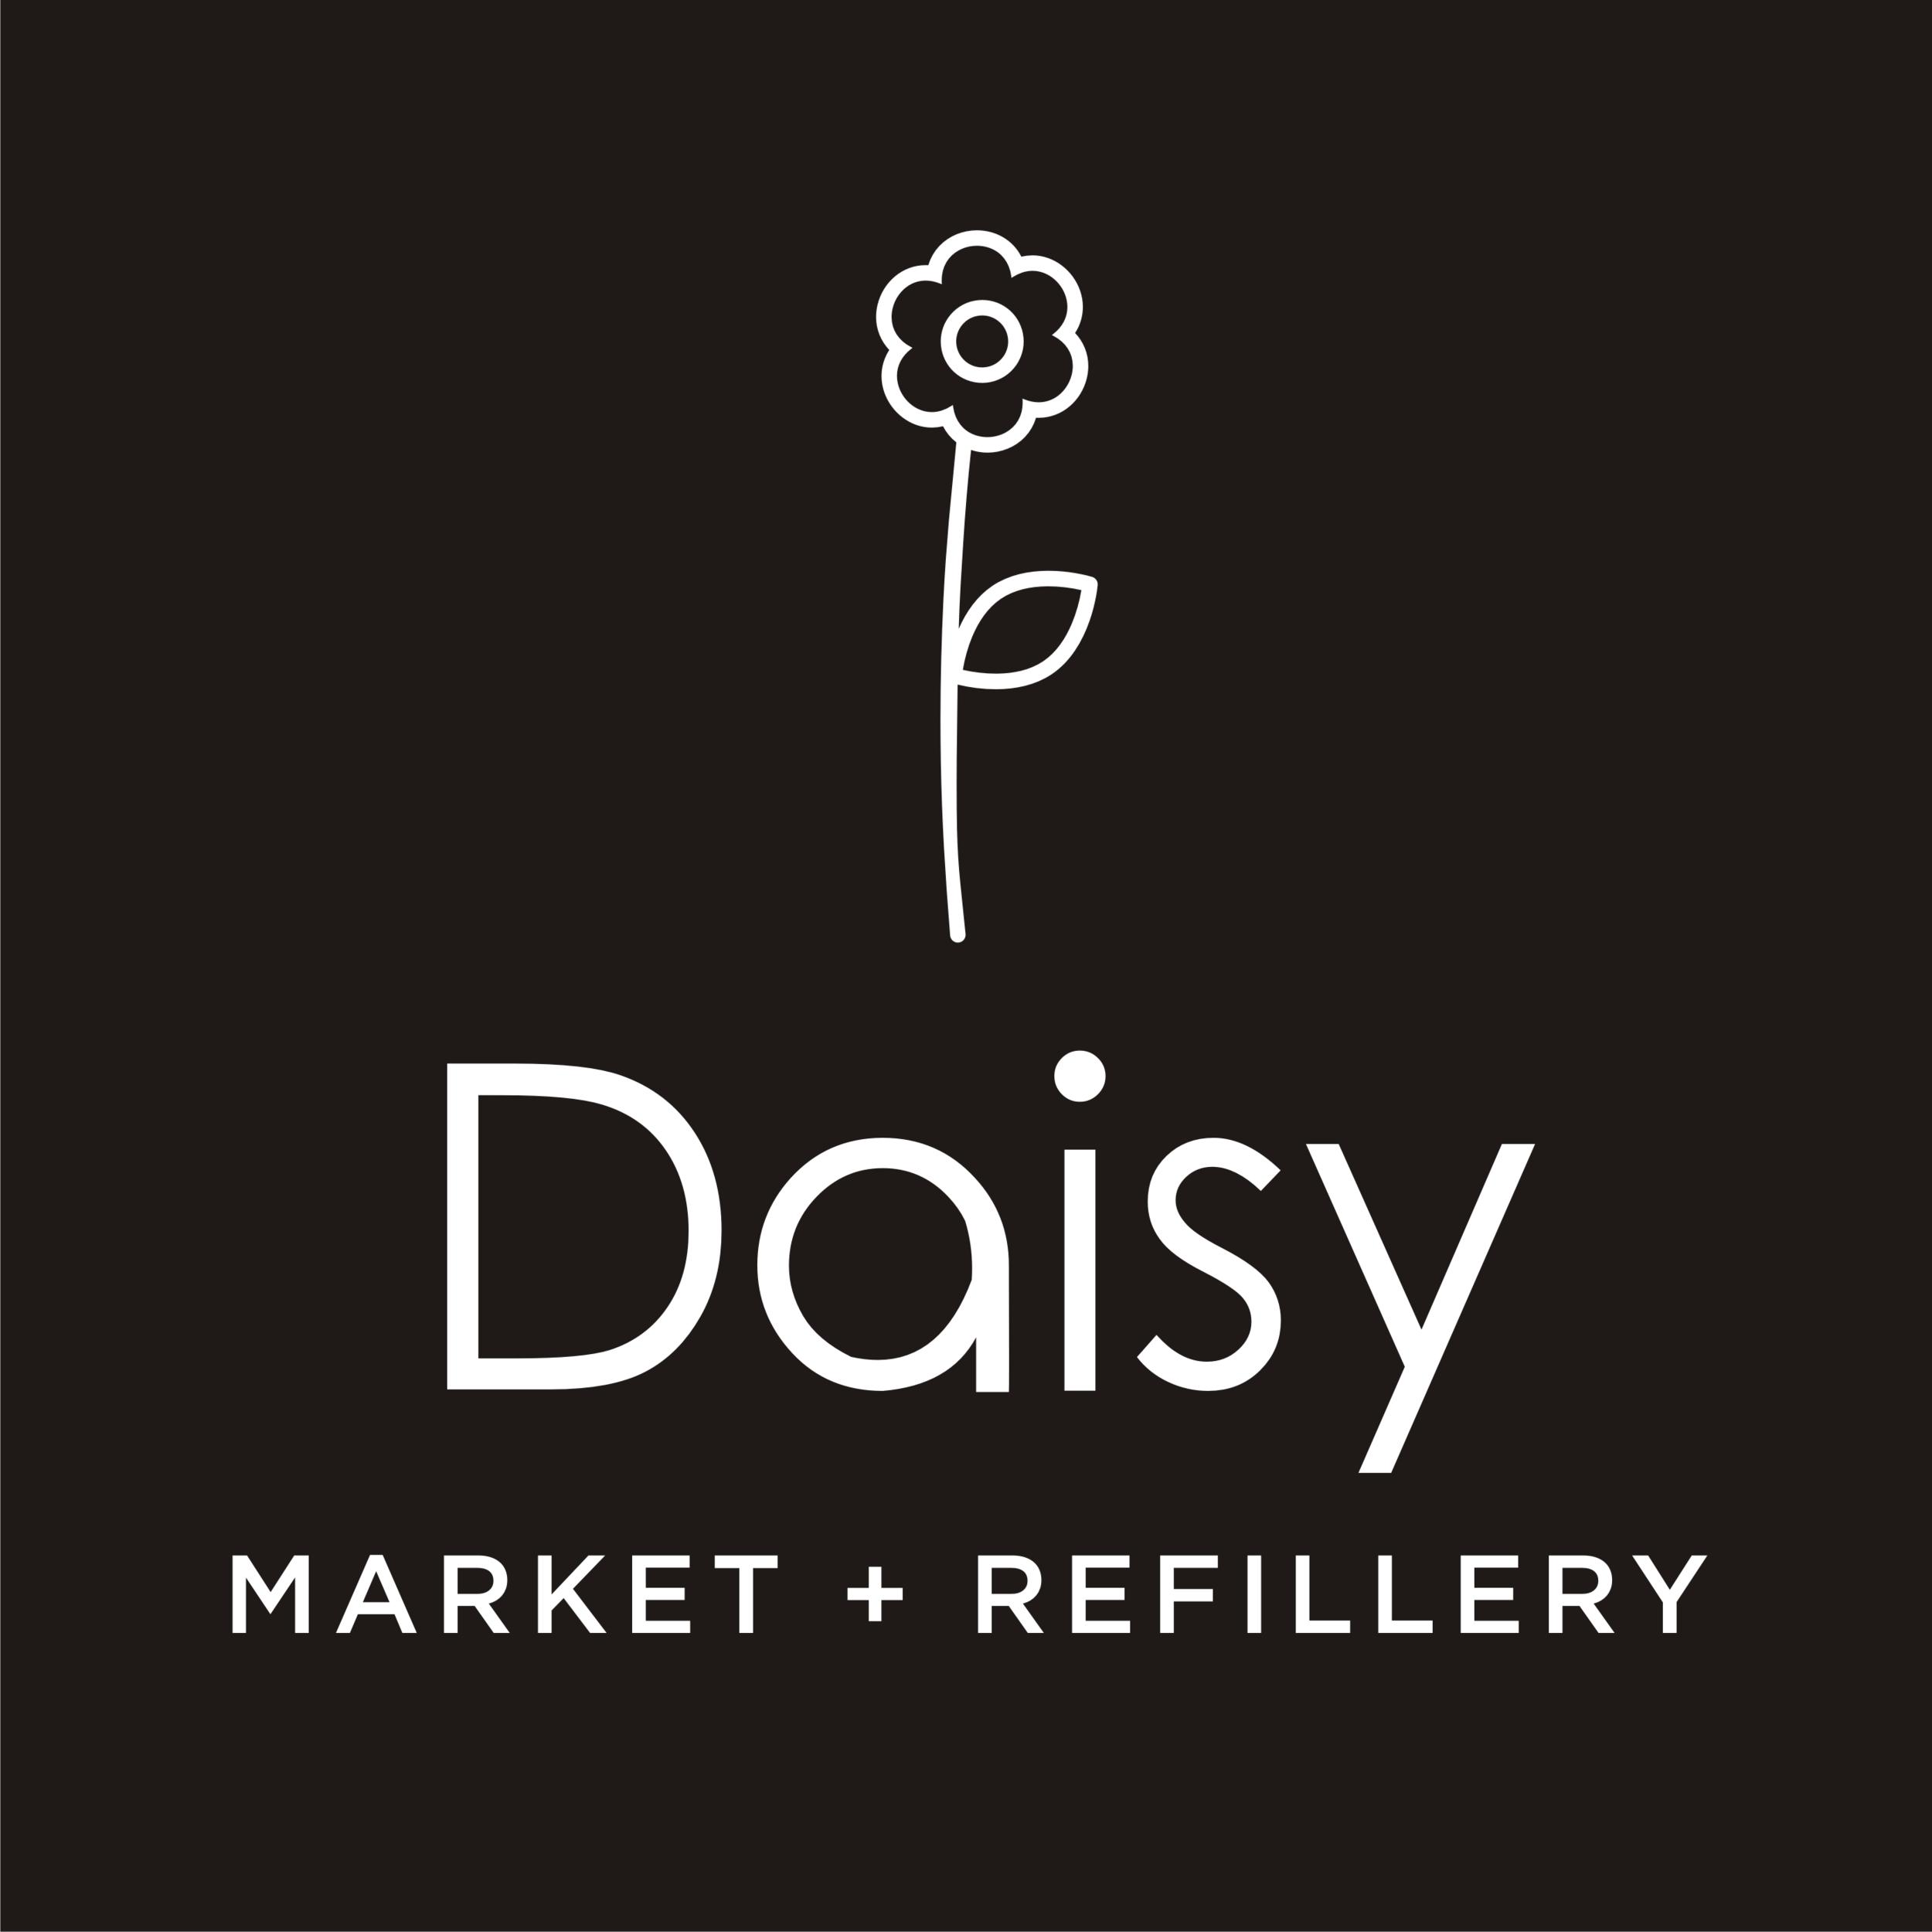 Daisy Market - logo (white on black).png